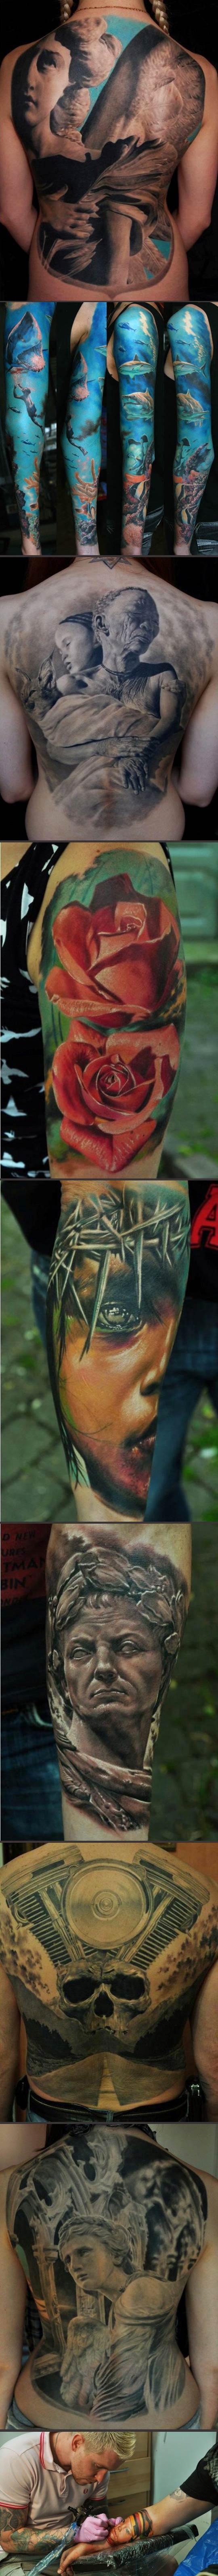 cool-compilation-tattoo-design